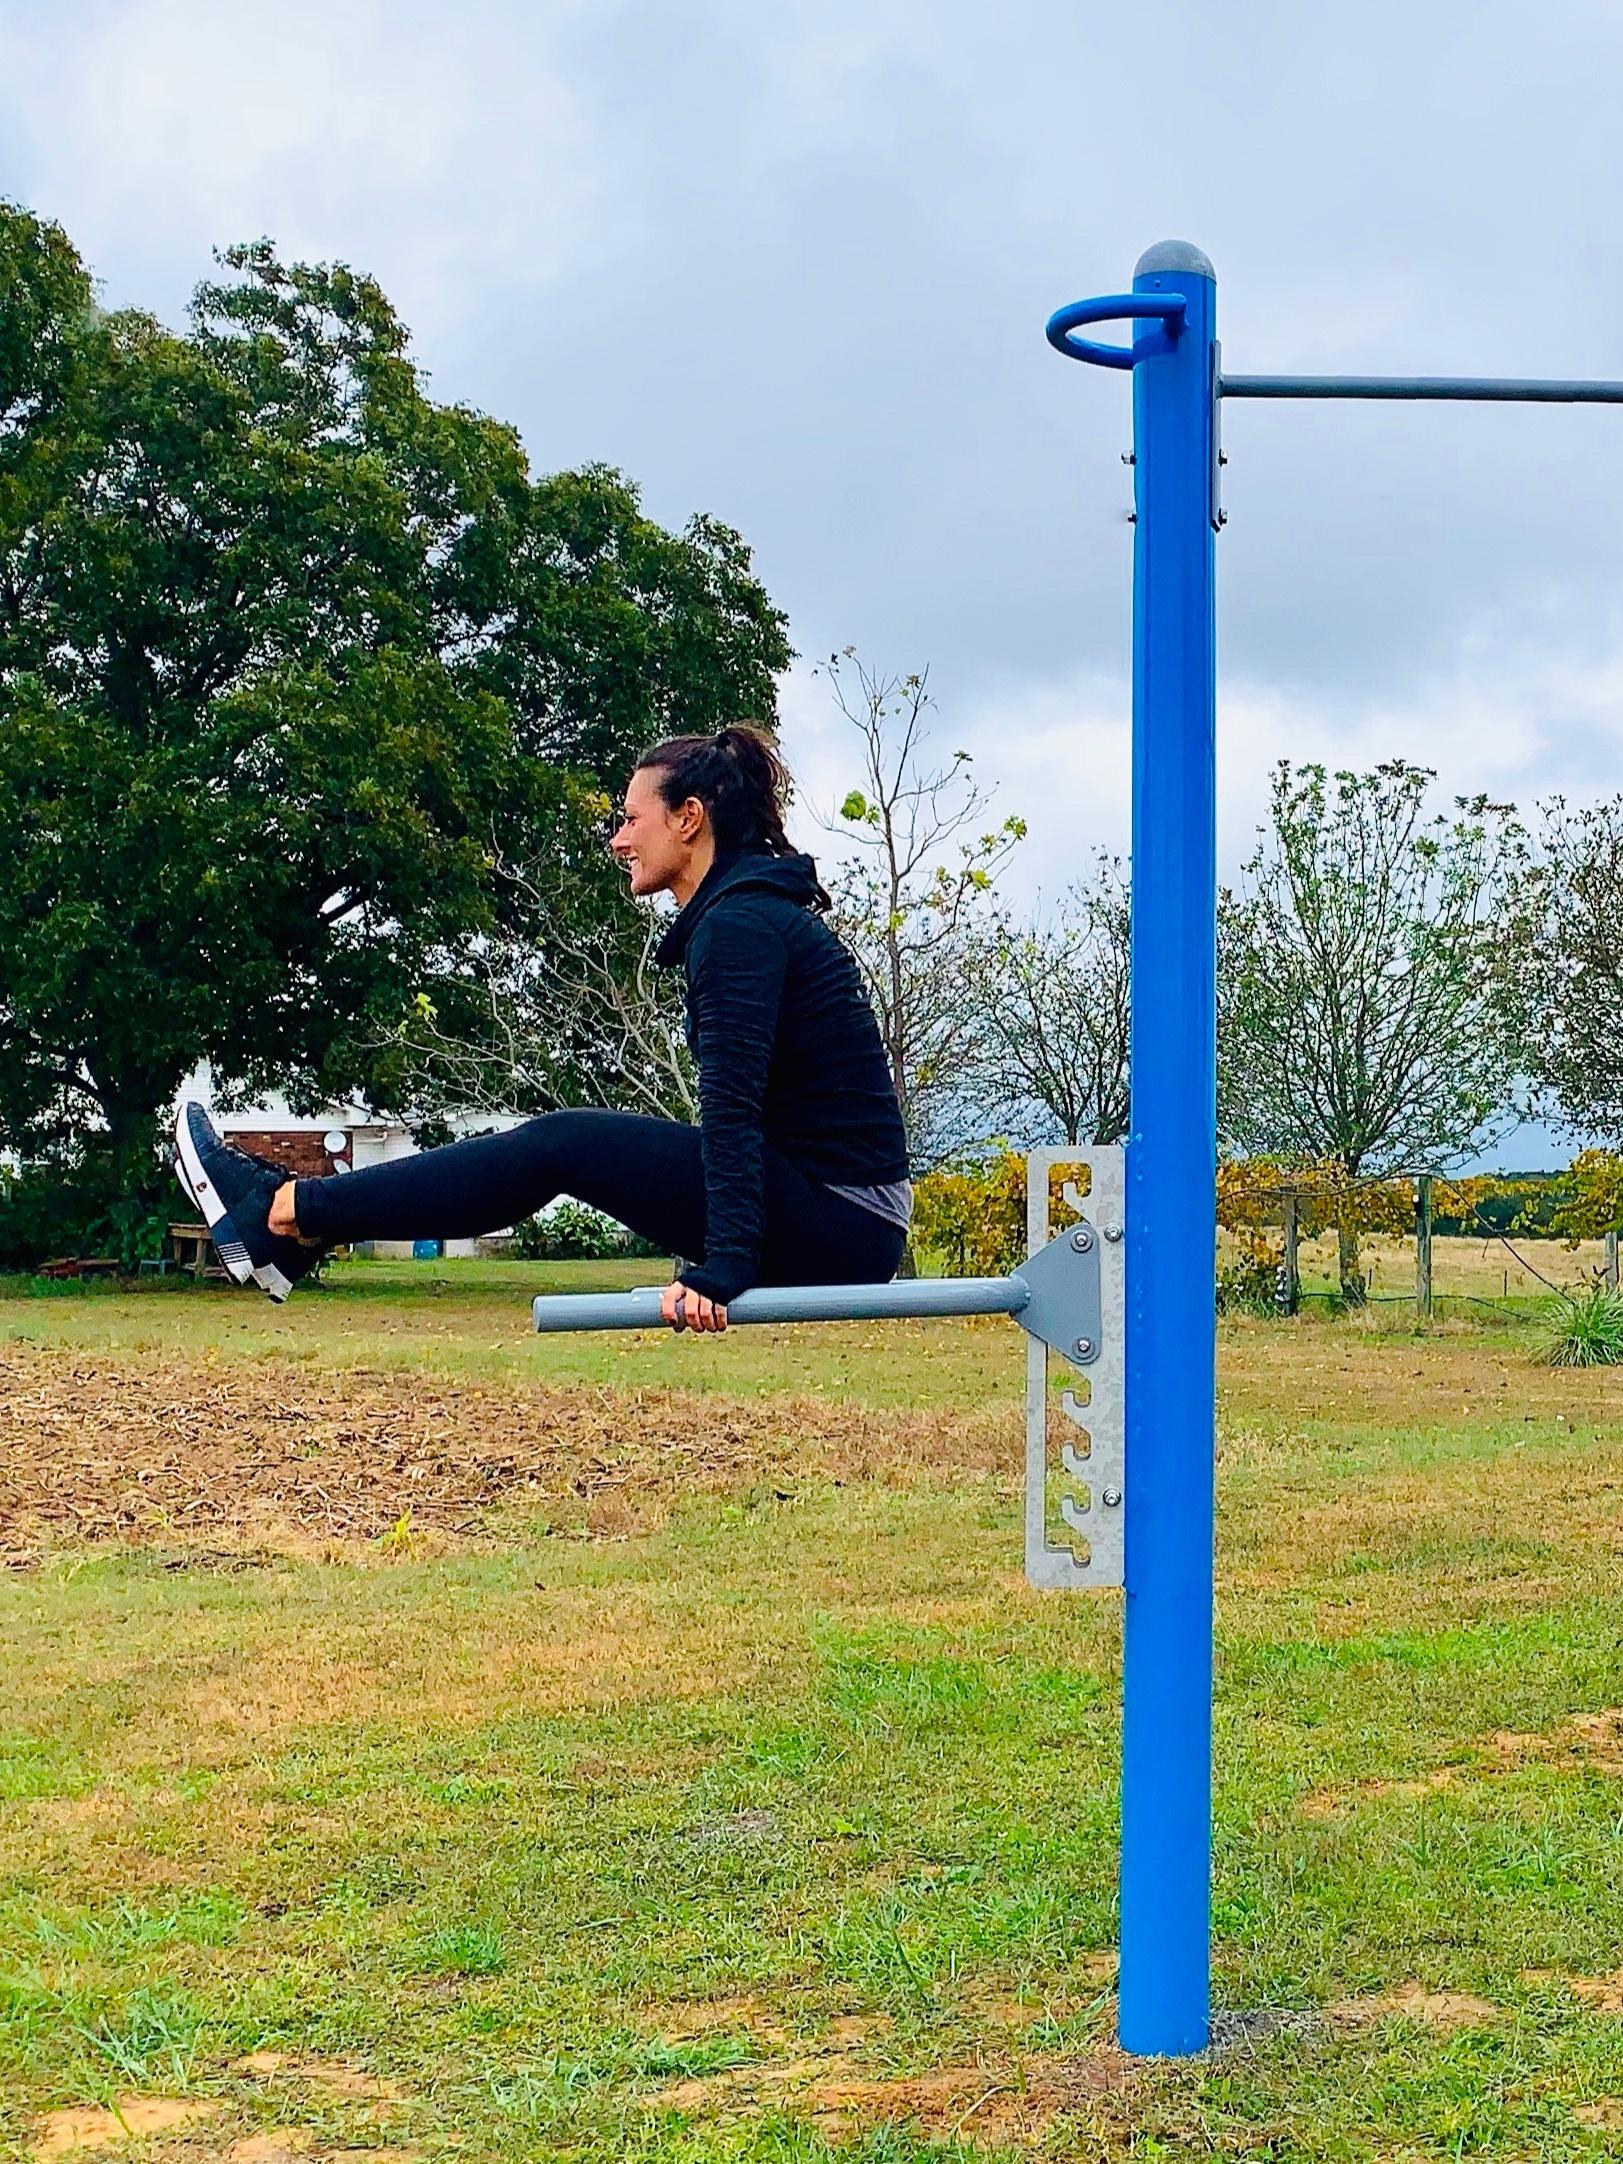 Dip Leg raise Outdoor Fitness Equipment